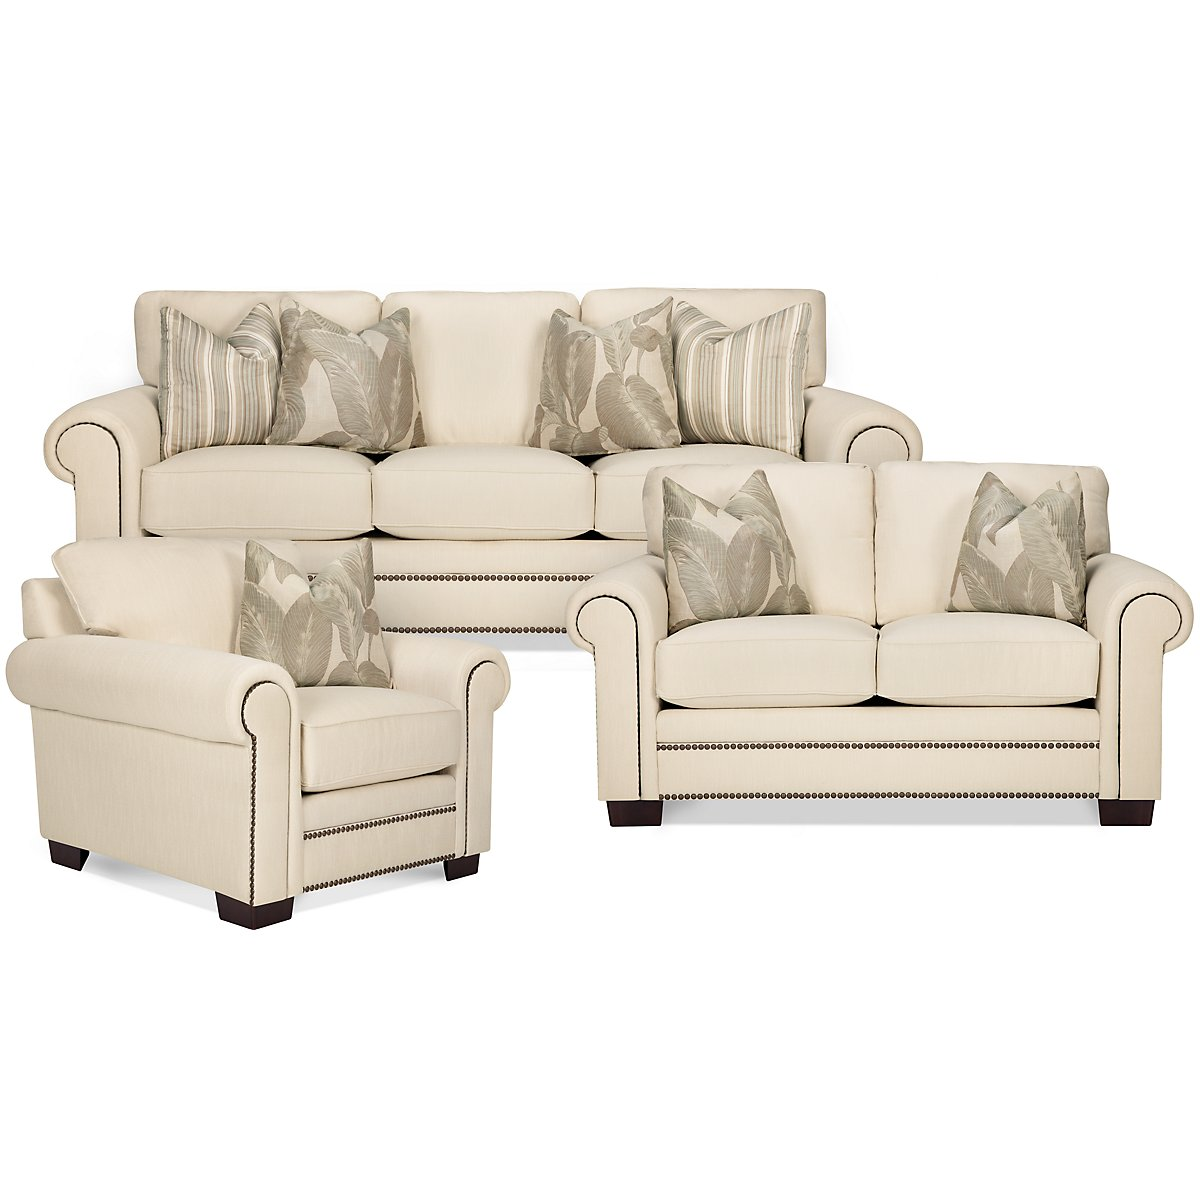 Erin White Fabric Living Room